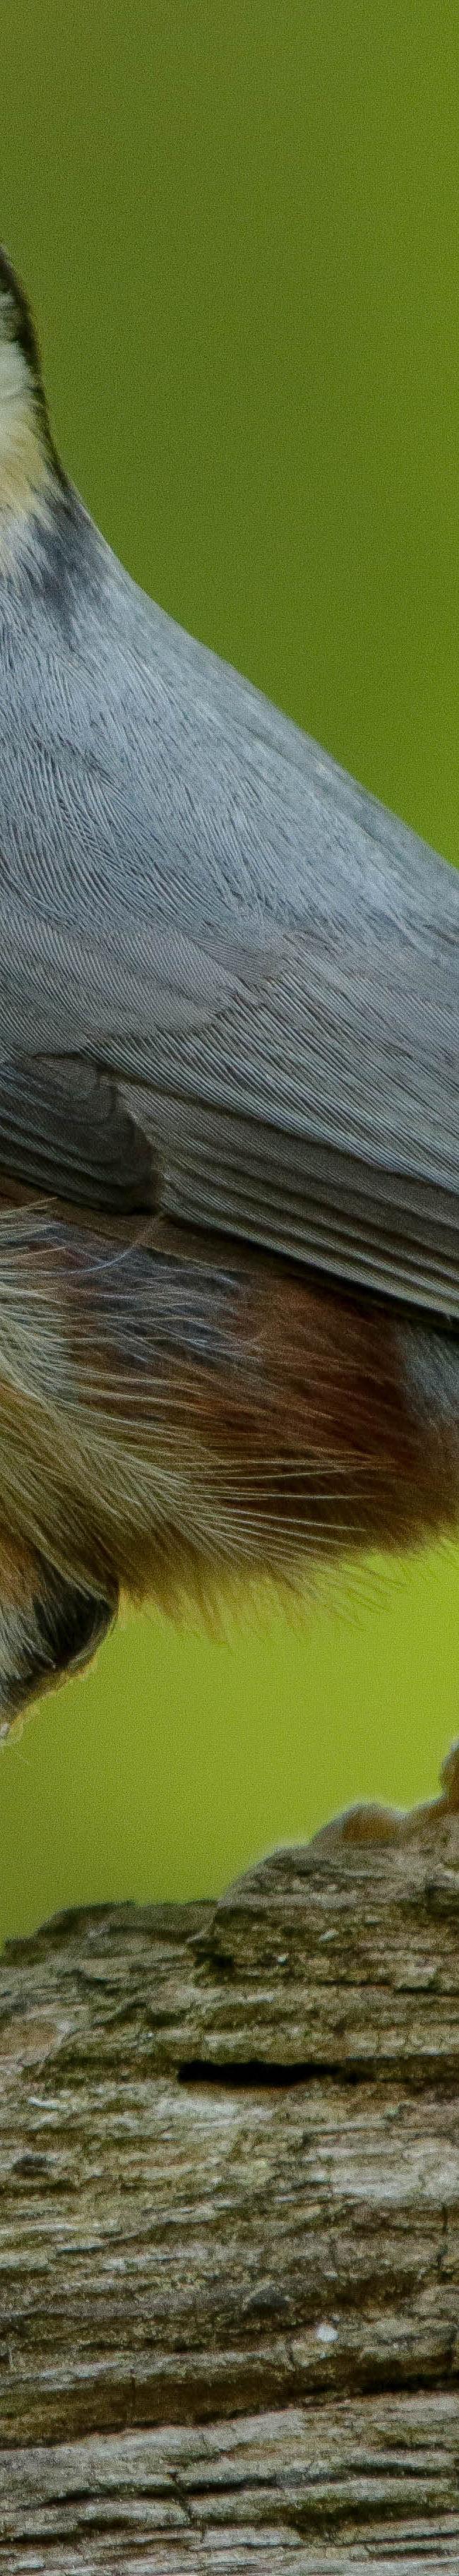 Boomklever (Sitta europaea)